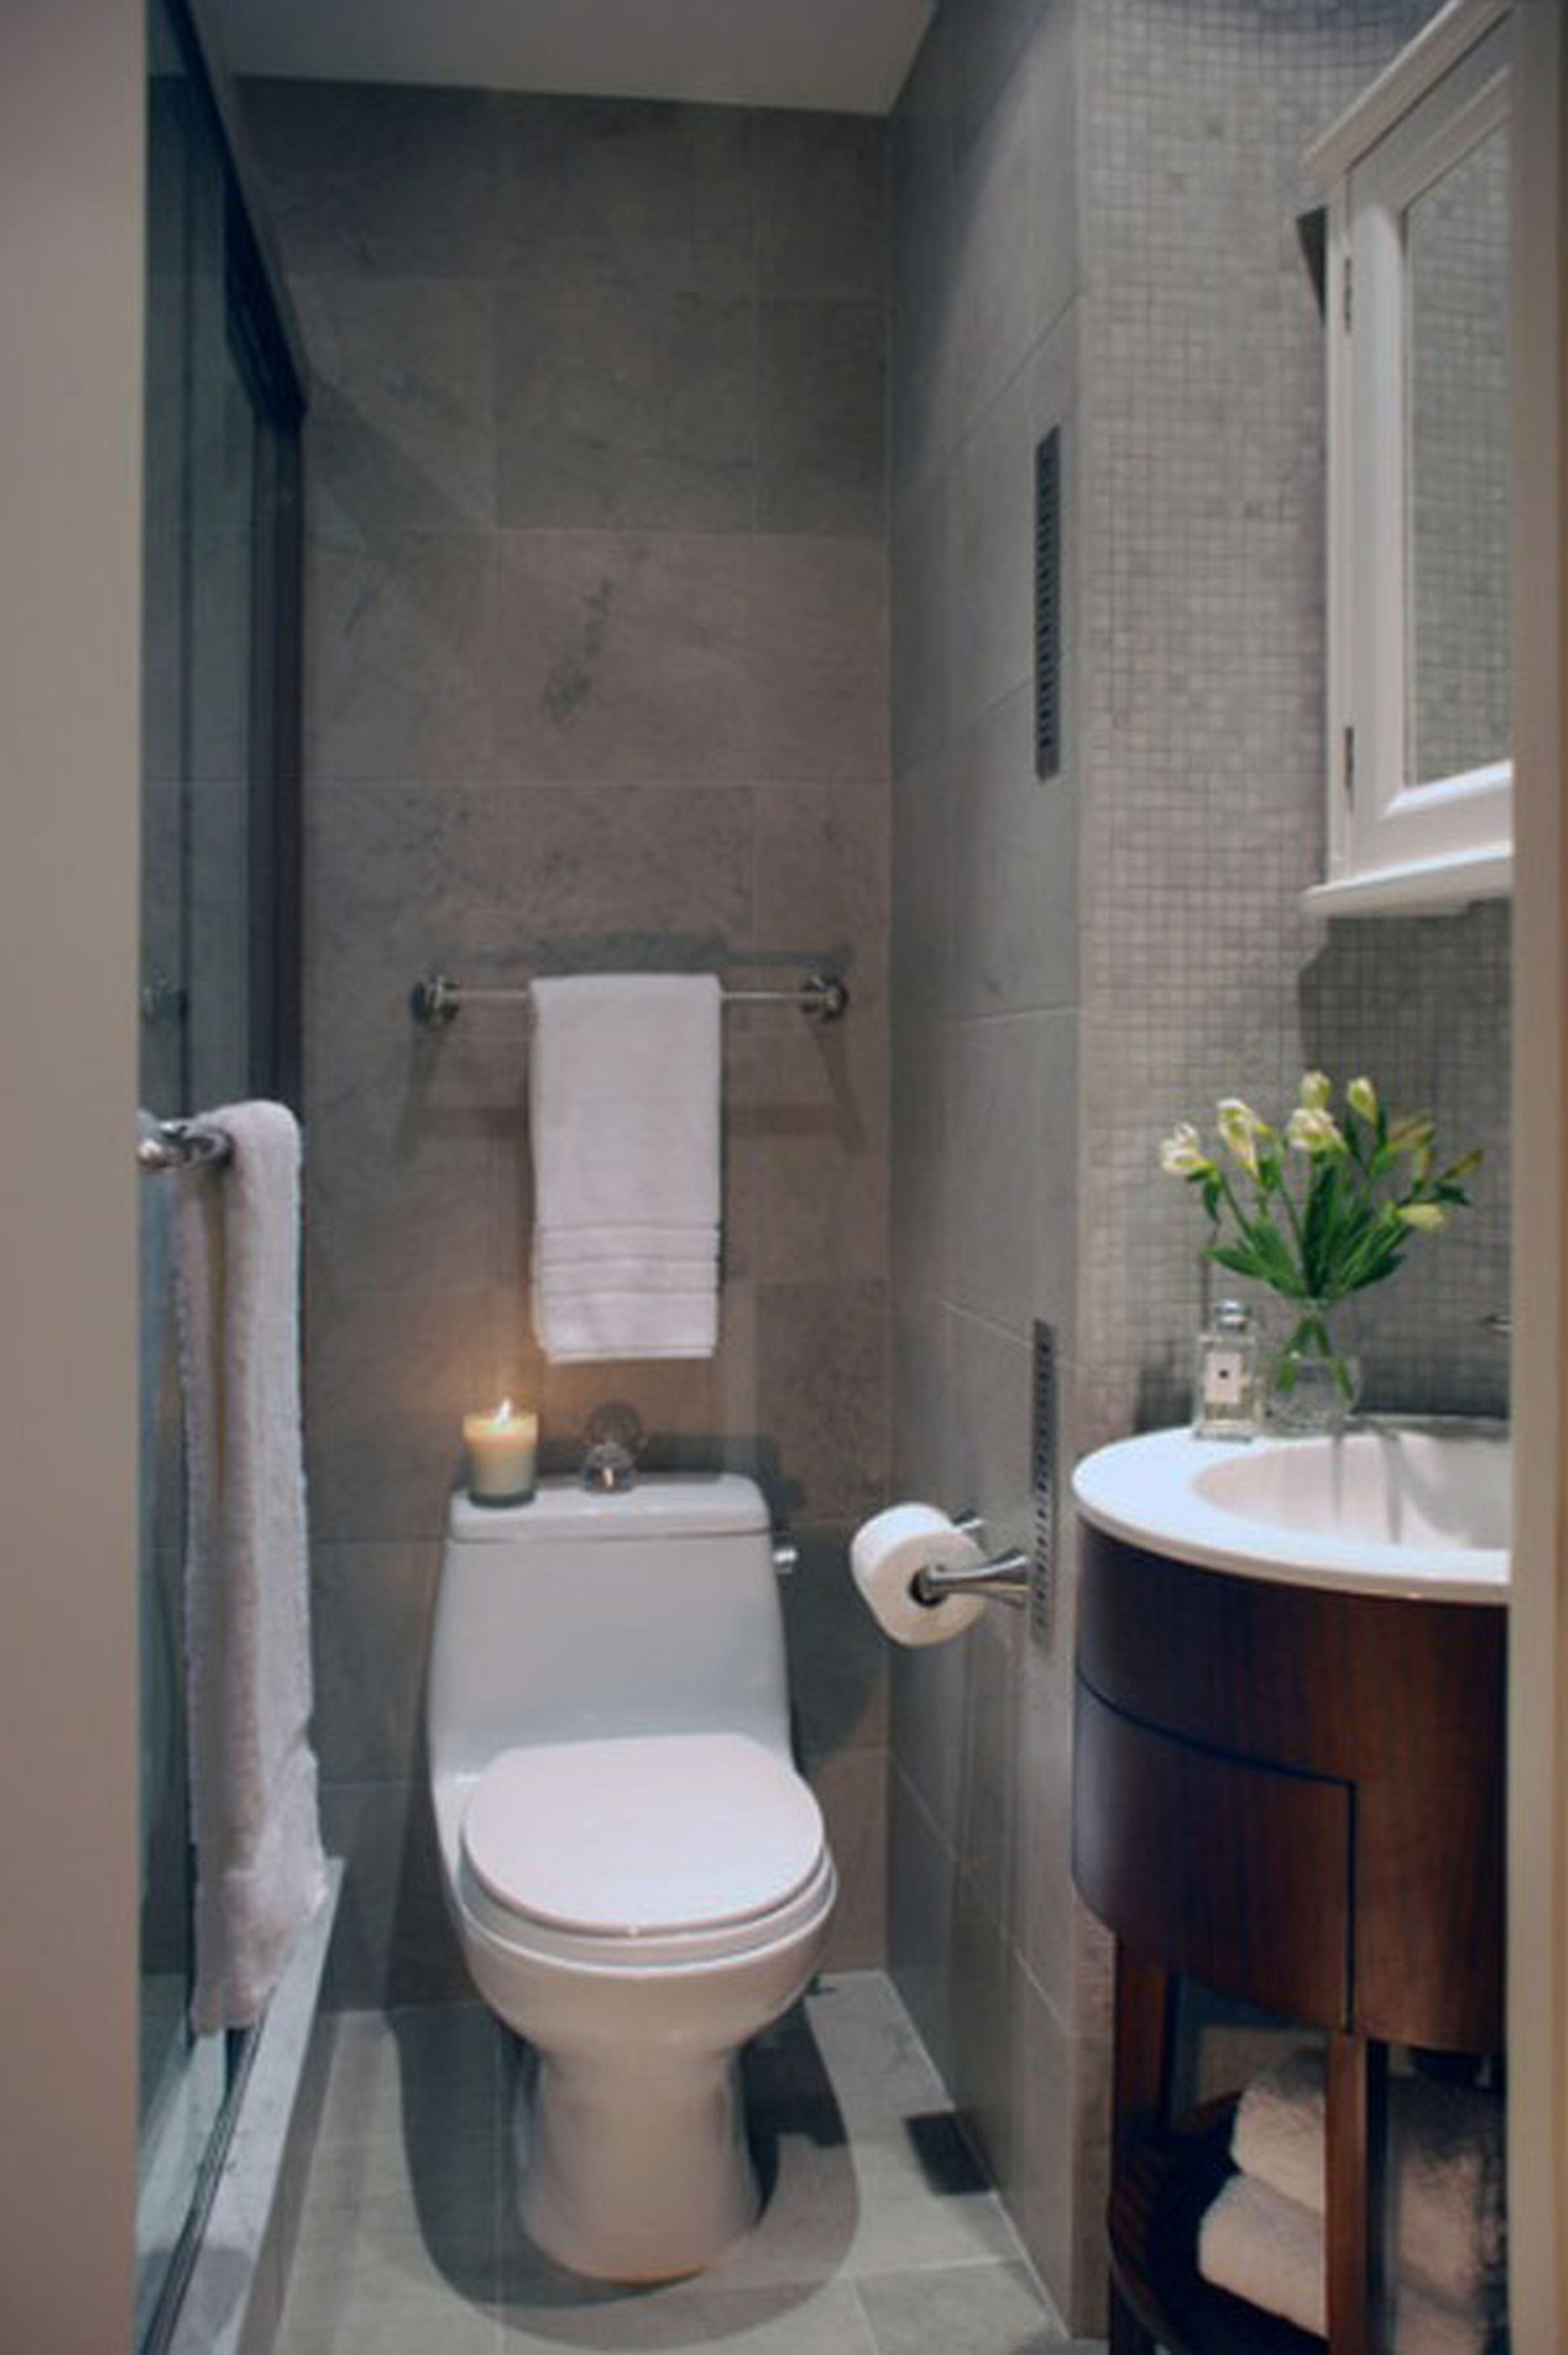 Small Ensuite Bathroom Decorating Ideas Interior Design Bathroom Small Washroom Design Very Small Bathroom